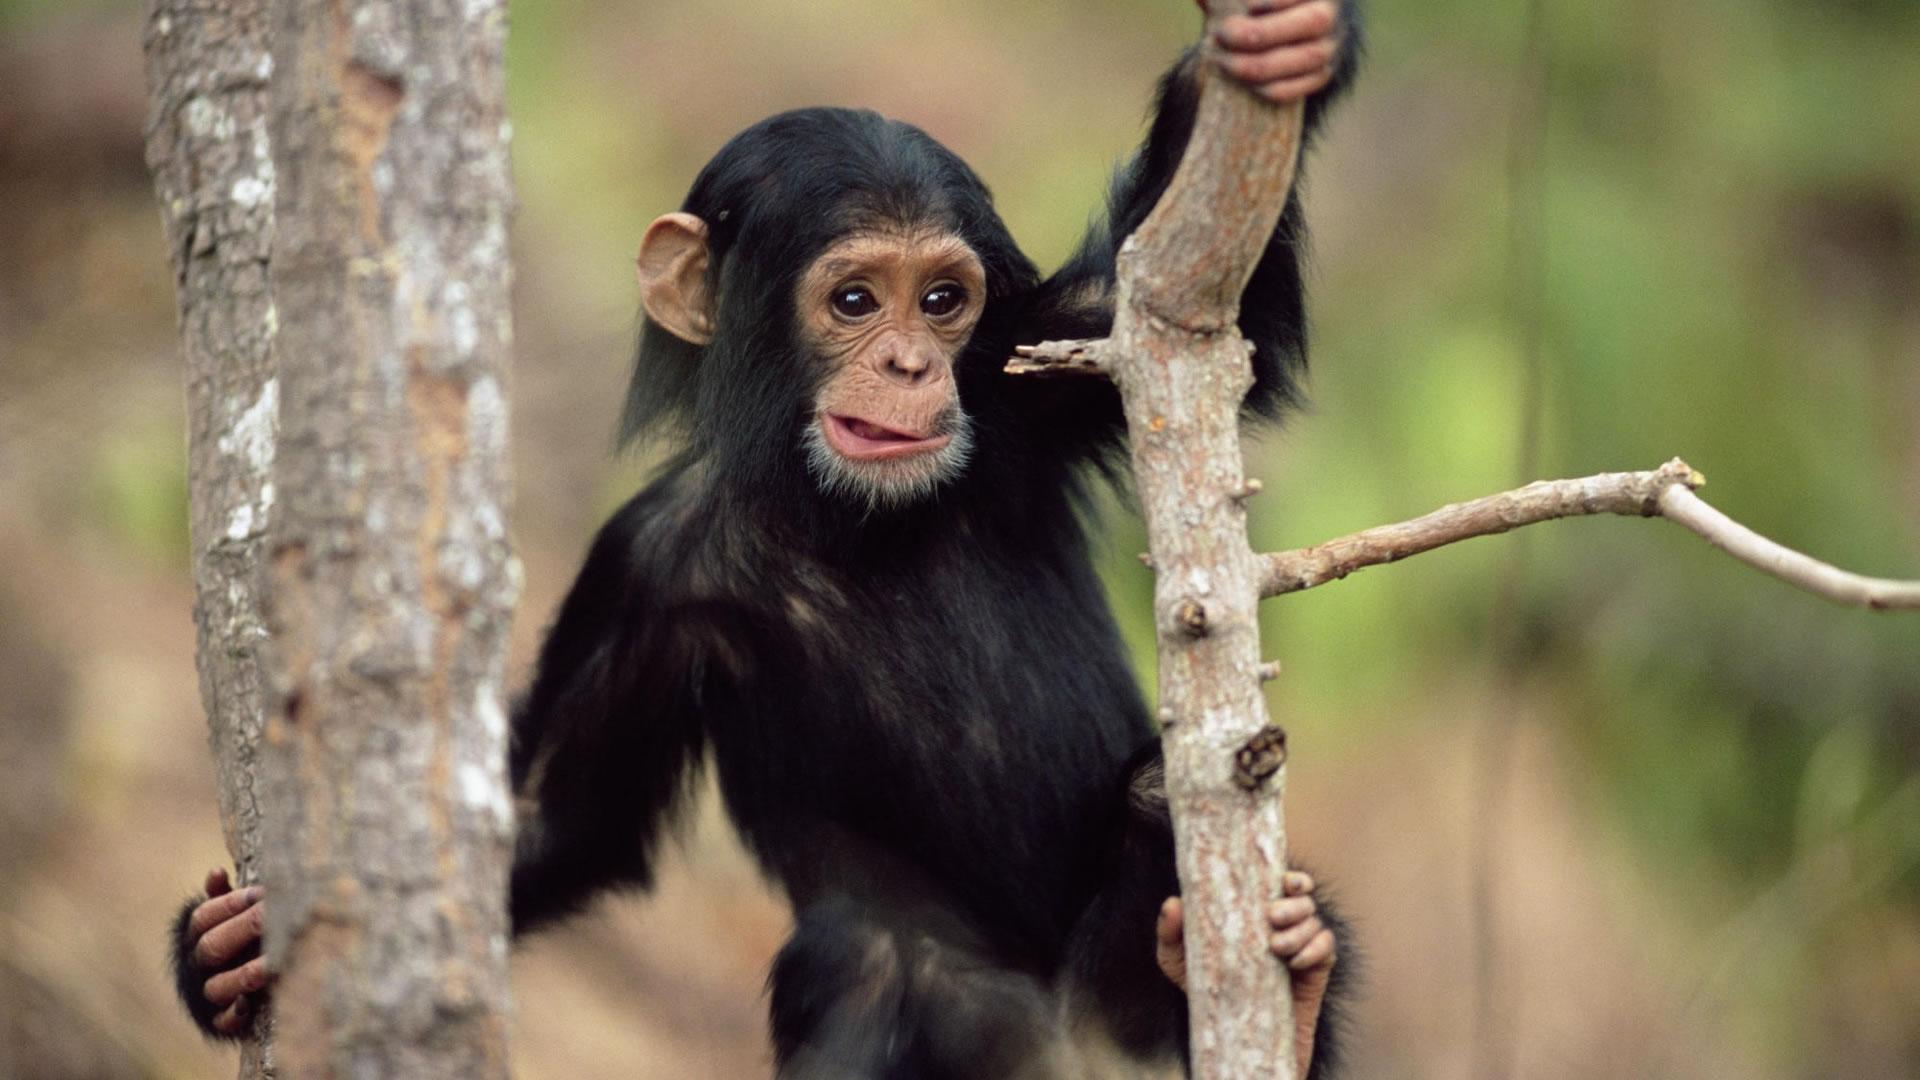 Download Baby Monkey Wallpaper | Full HD Wallpapers